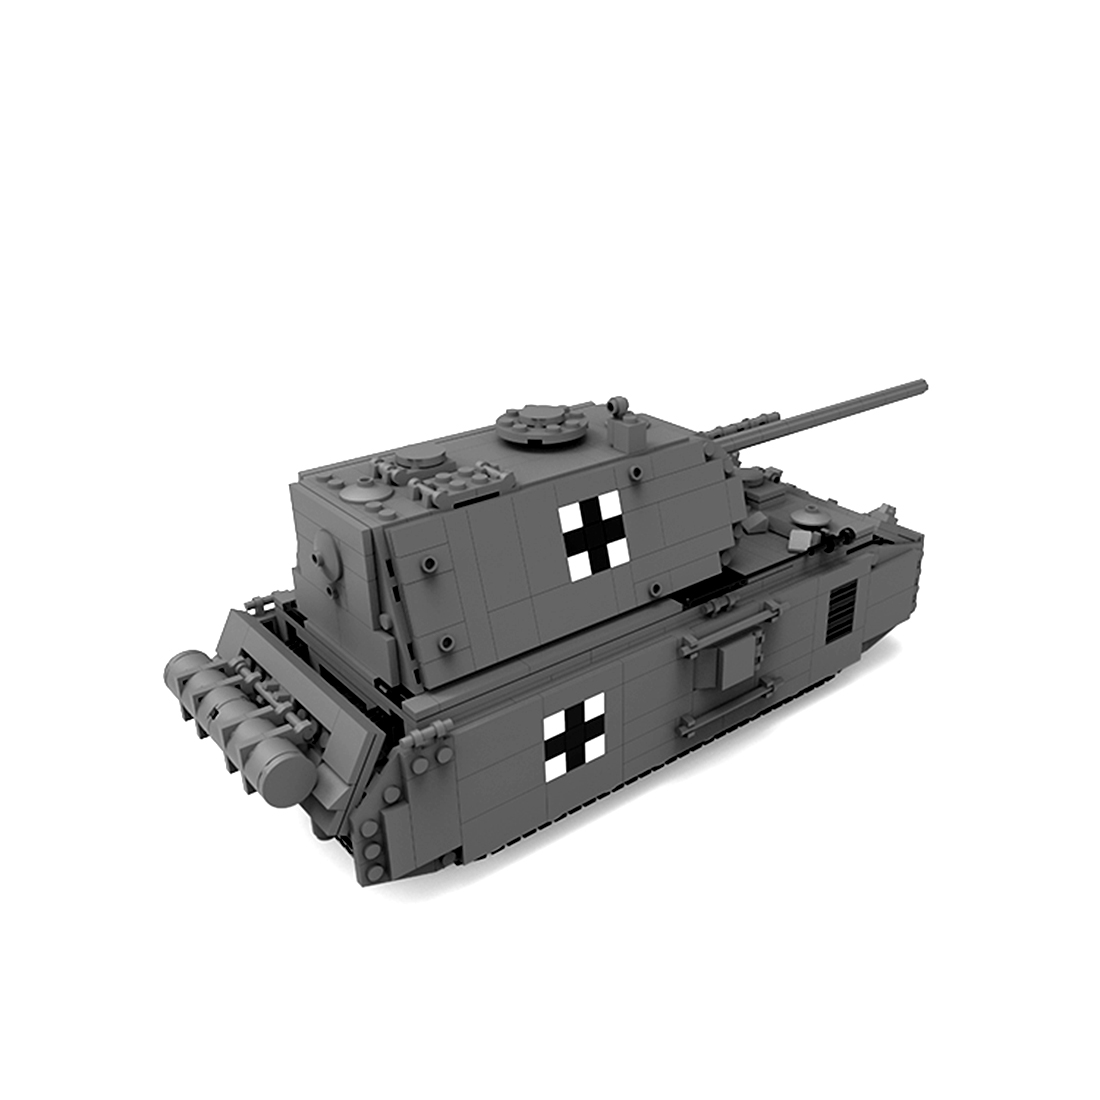 1121Pcs MOC DIY Small Particle Building Block Military Tank Model Rat Super Heavy Tank Bricks For Children Kids Toys - Dark Grey